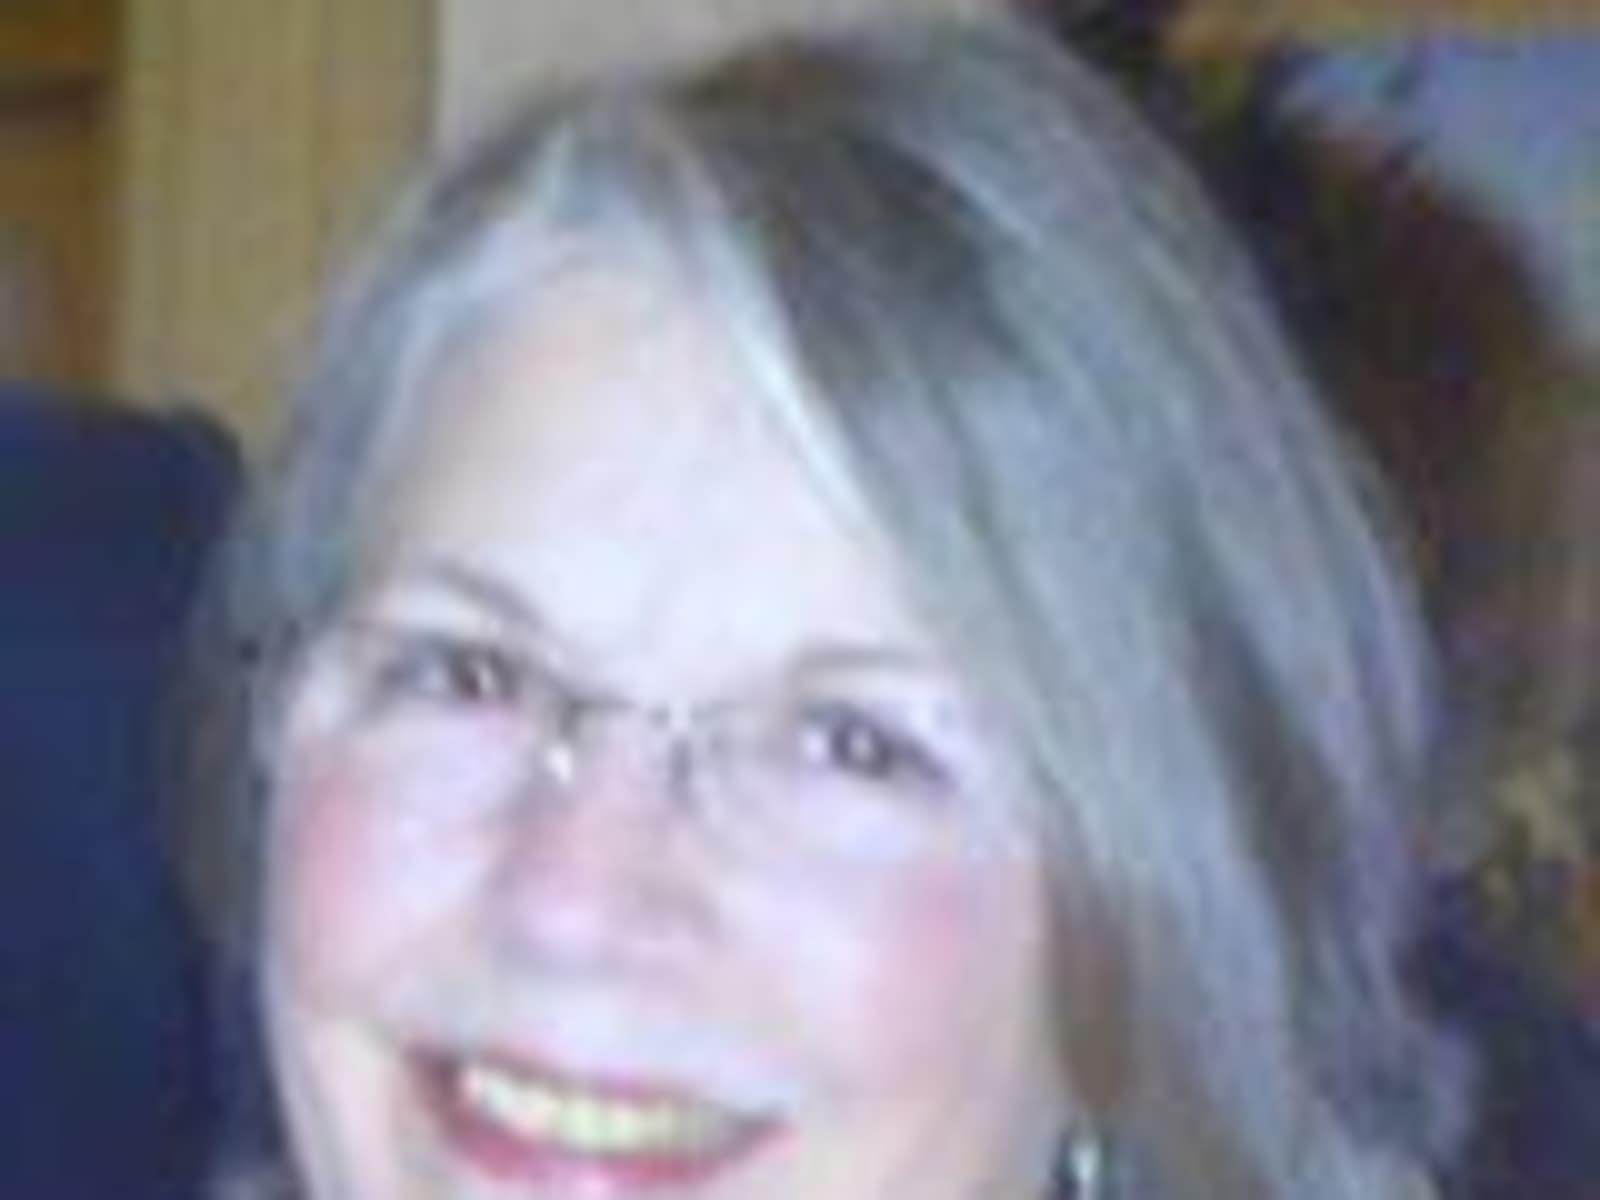 Susan frances from Basildon, United Kingdom